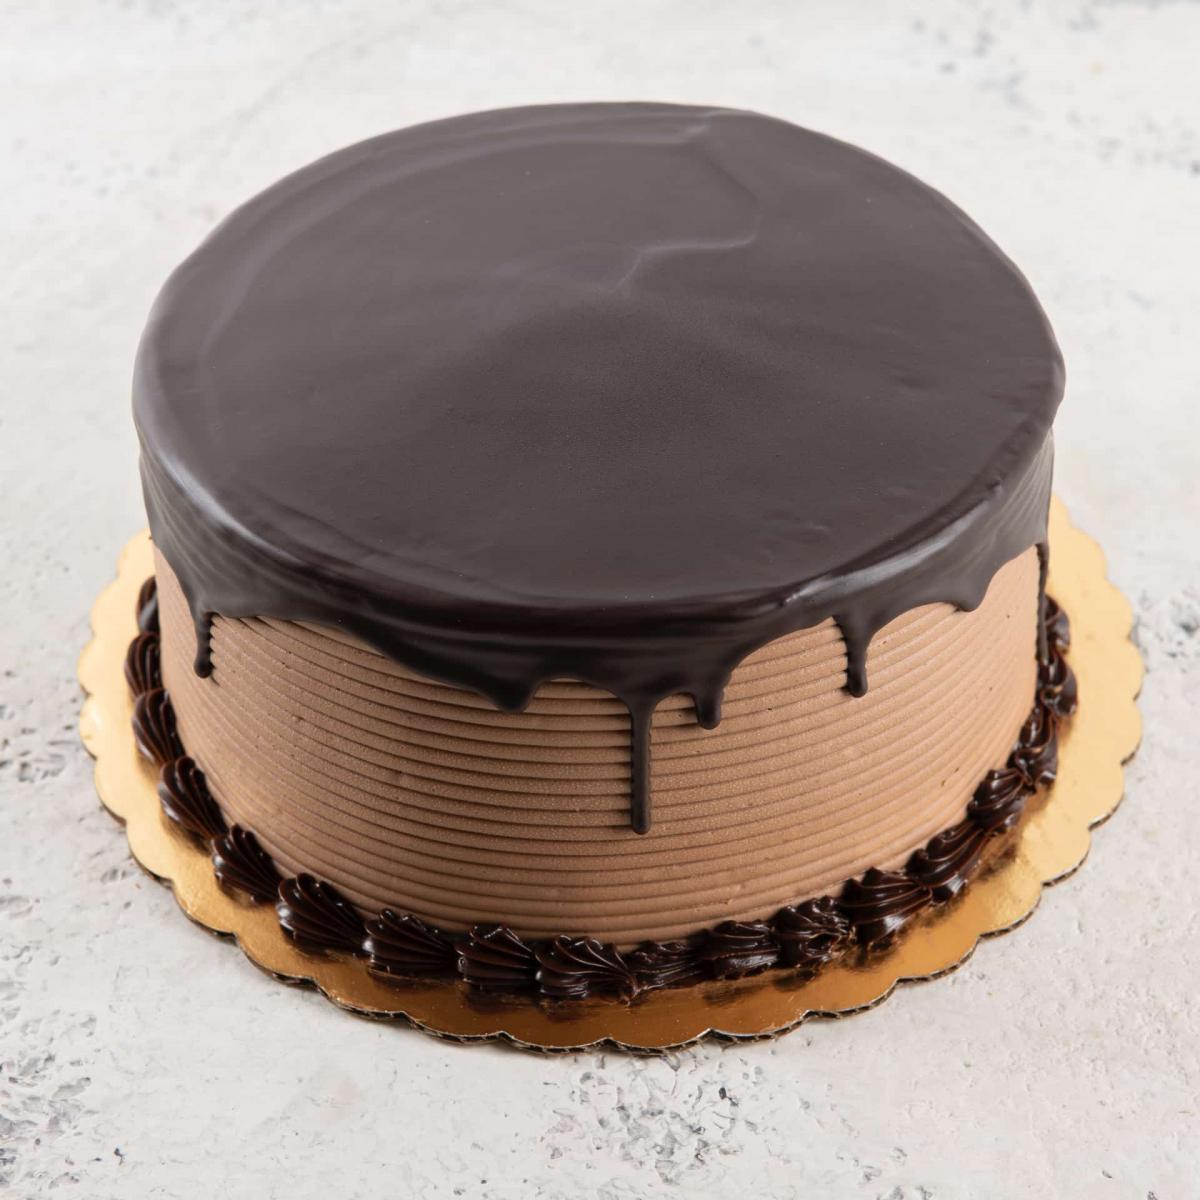 Chocolate Overflow Cake